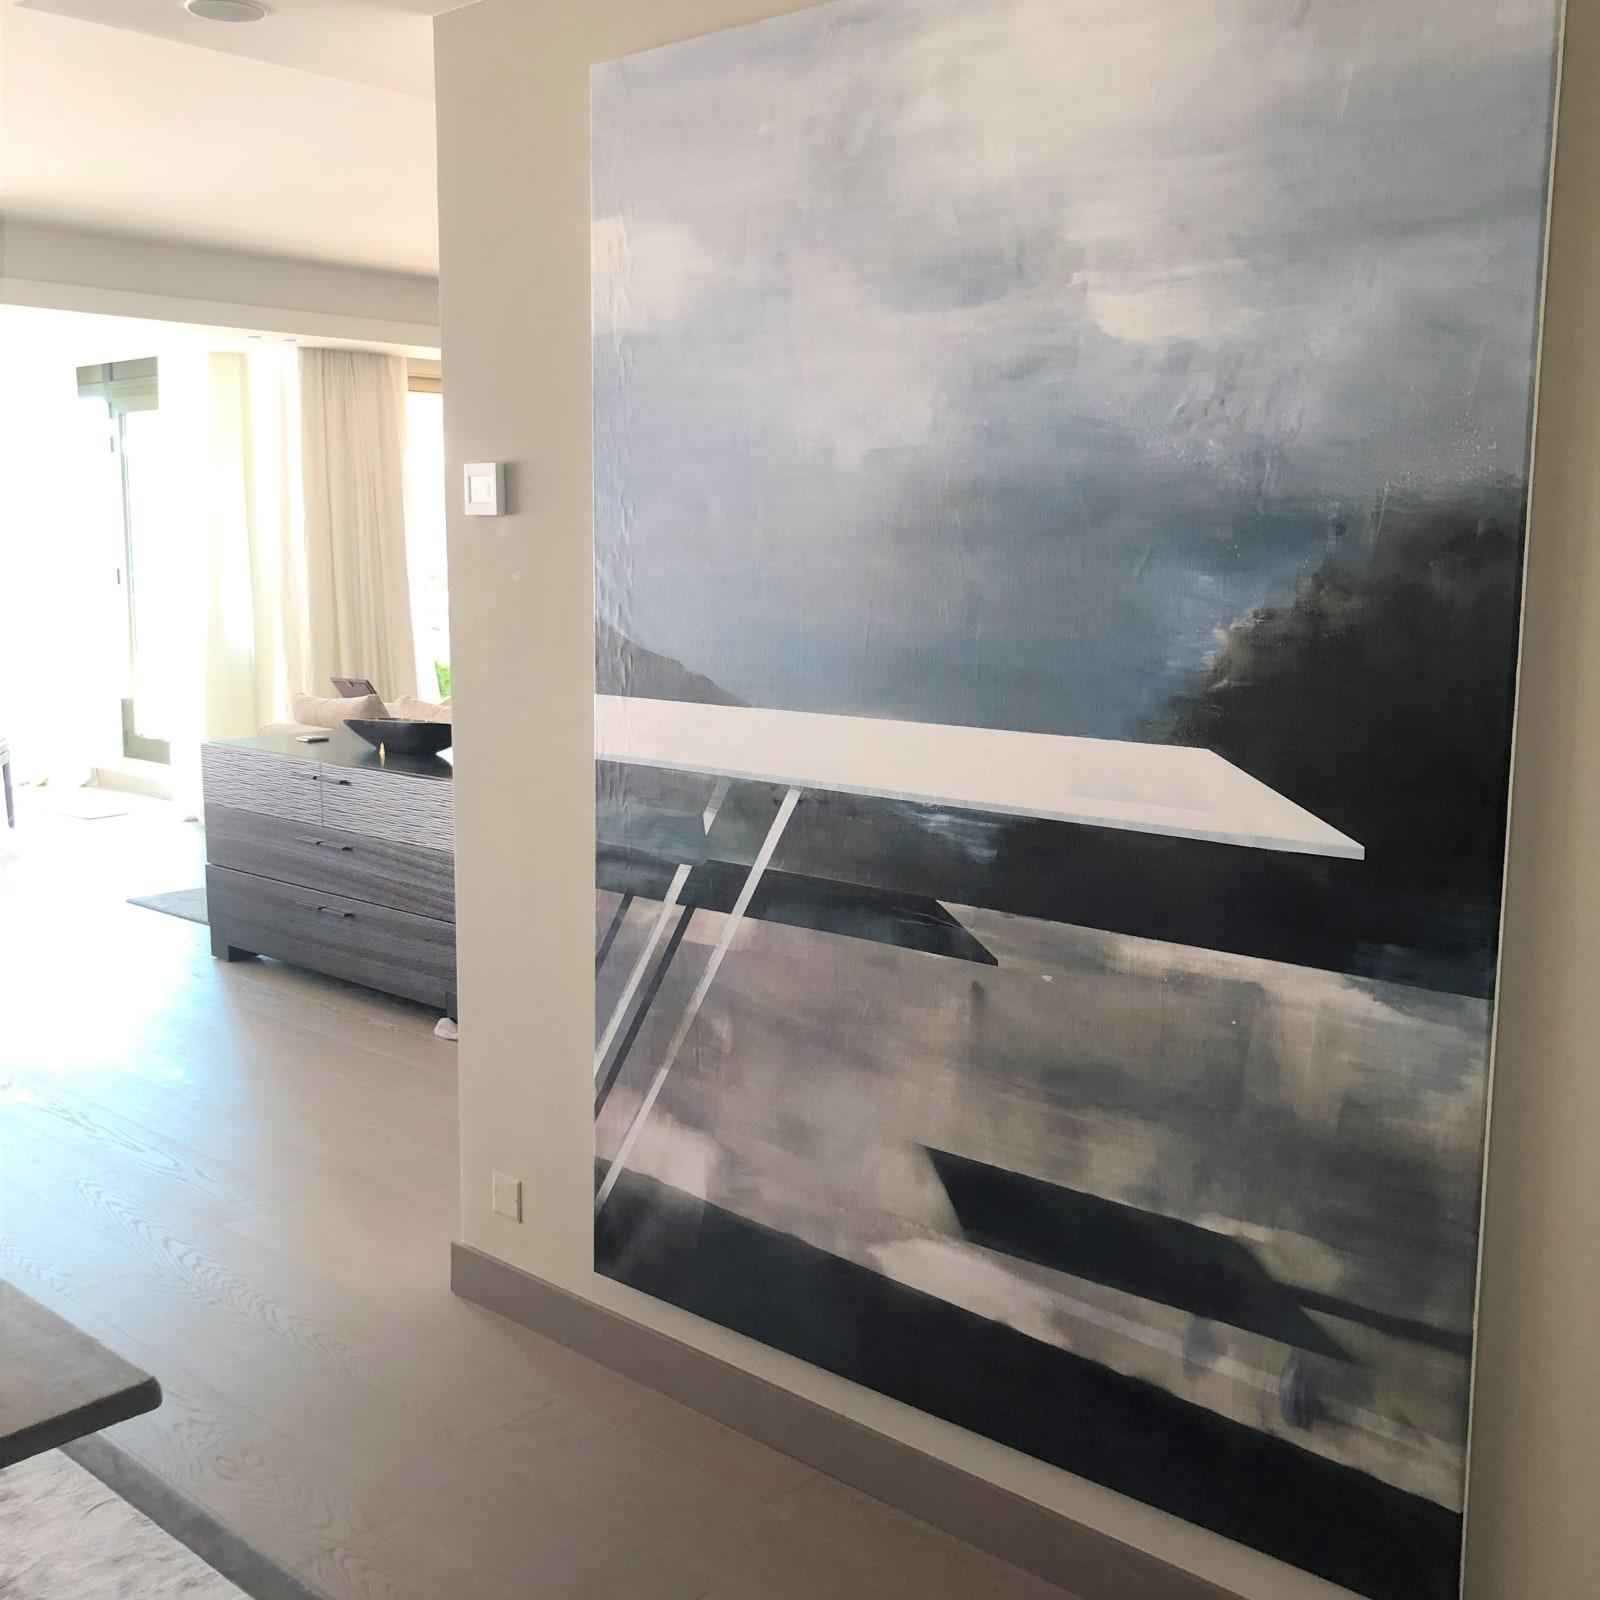 Stephane Villafane in a Monaco apartment